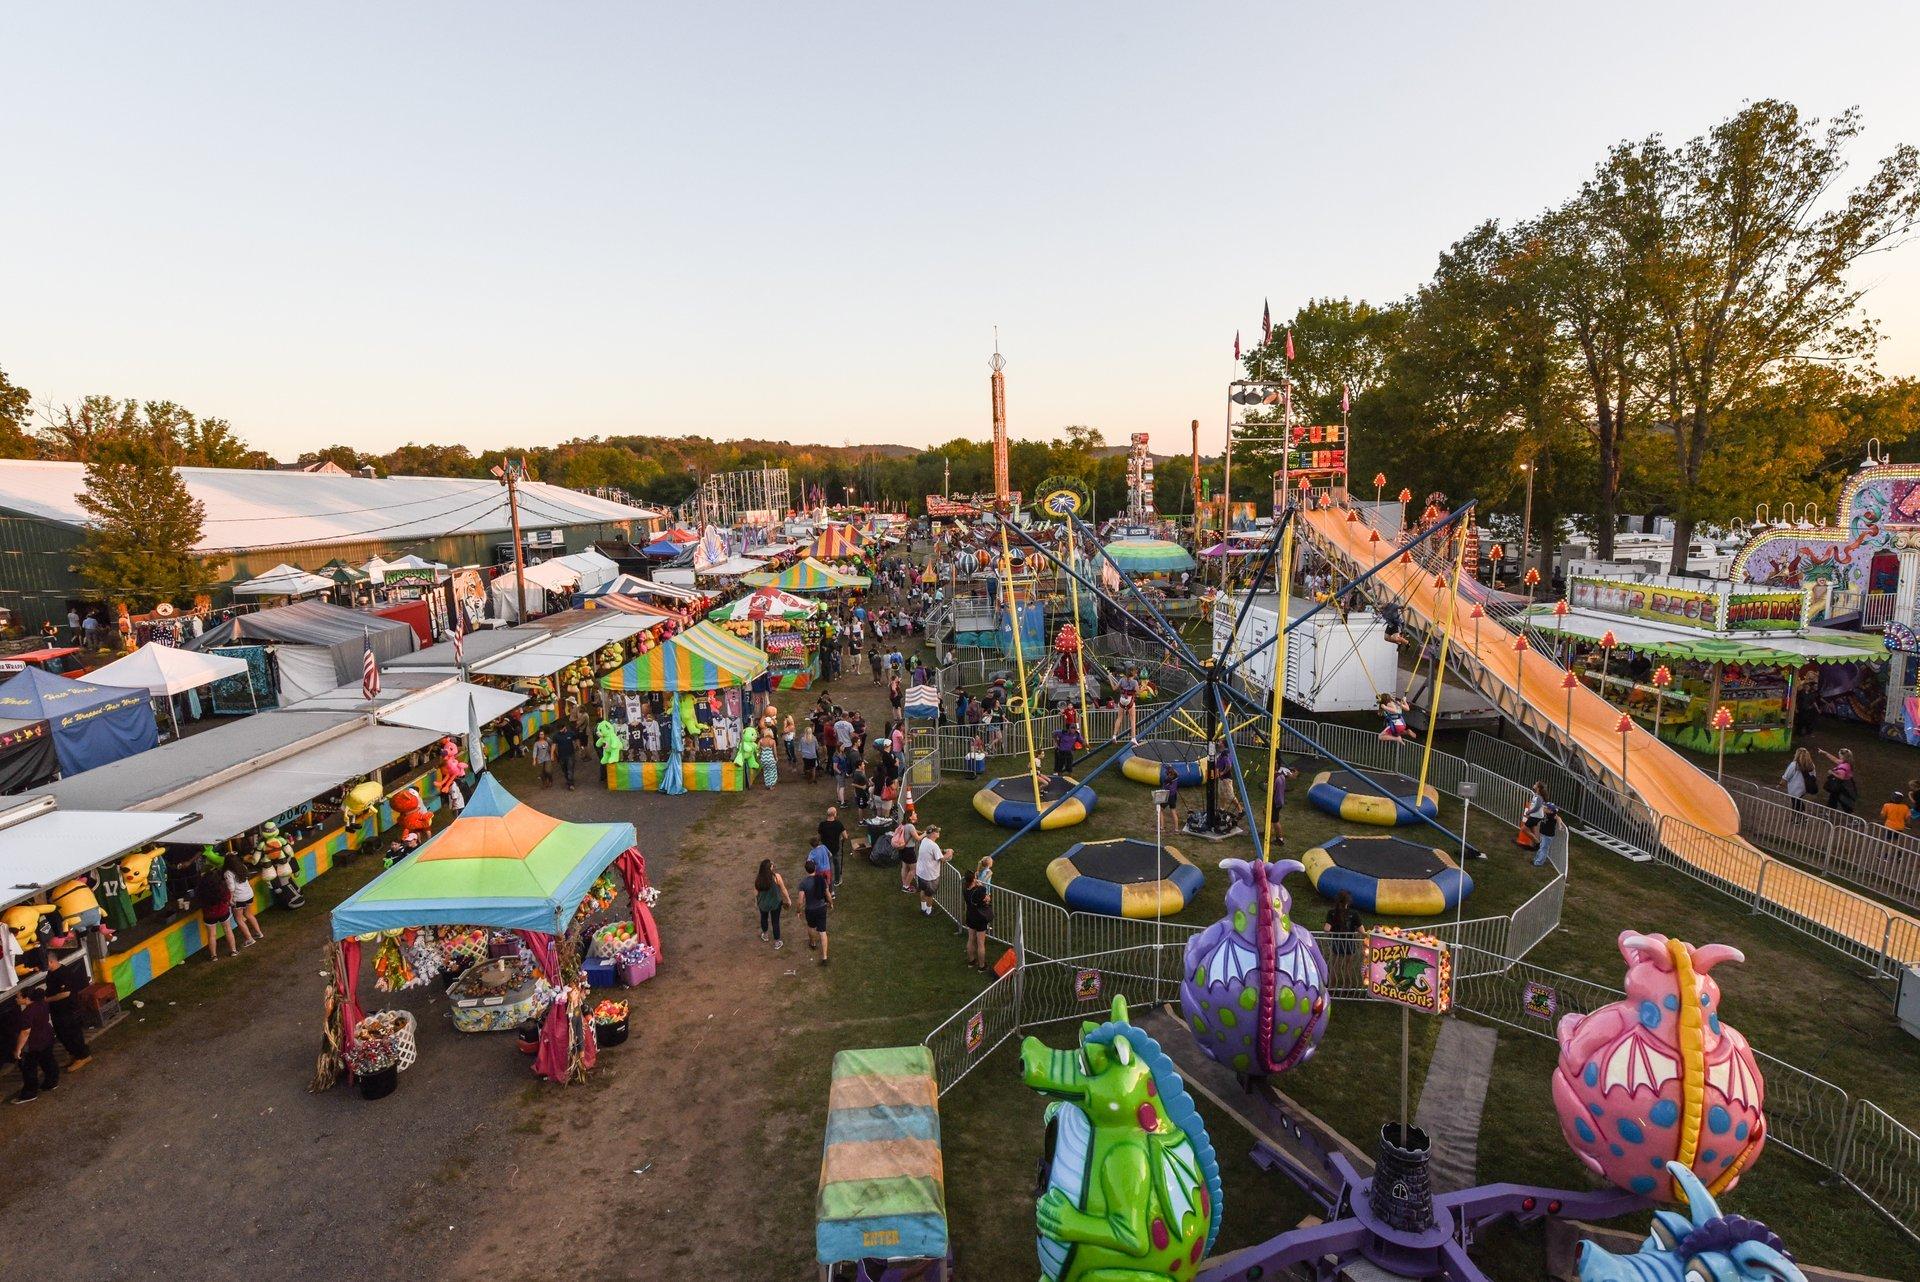 Durham Fair in Connecticut - Best Season 2020